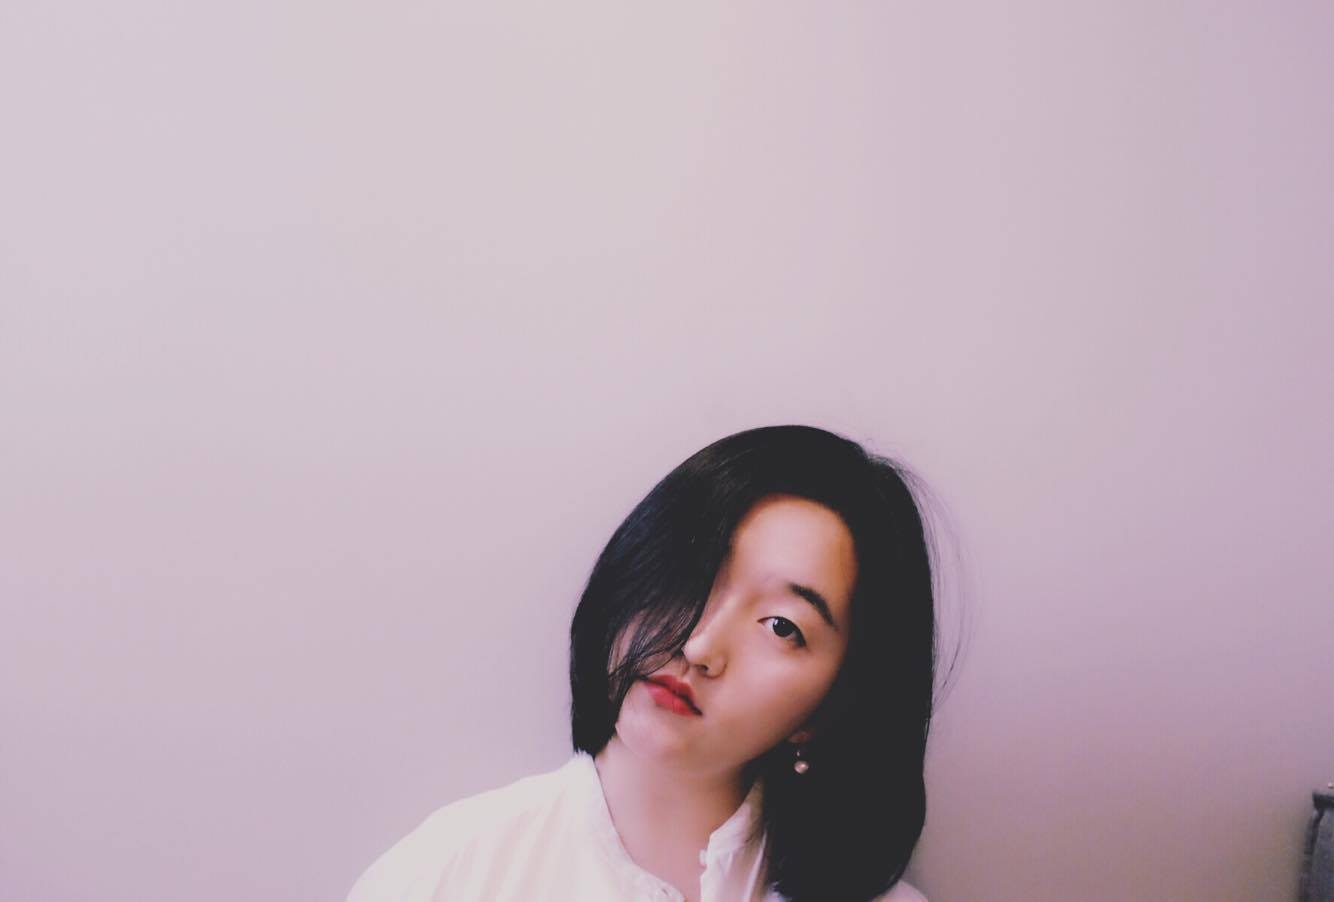 Yaoqi LAI